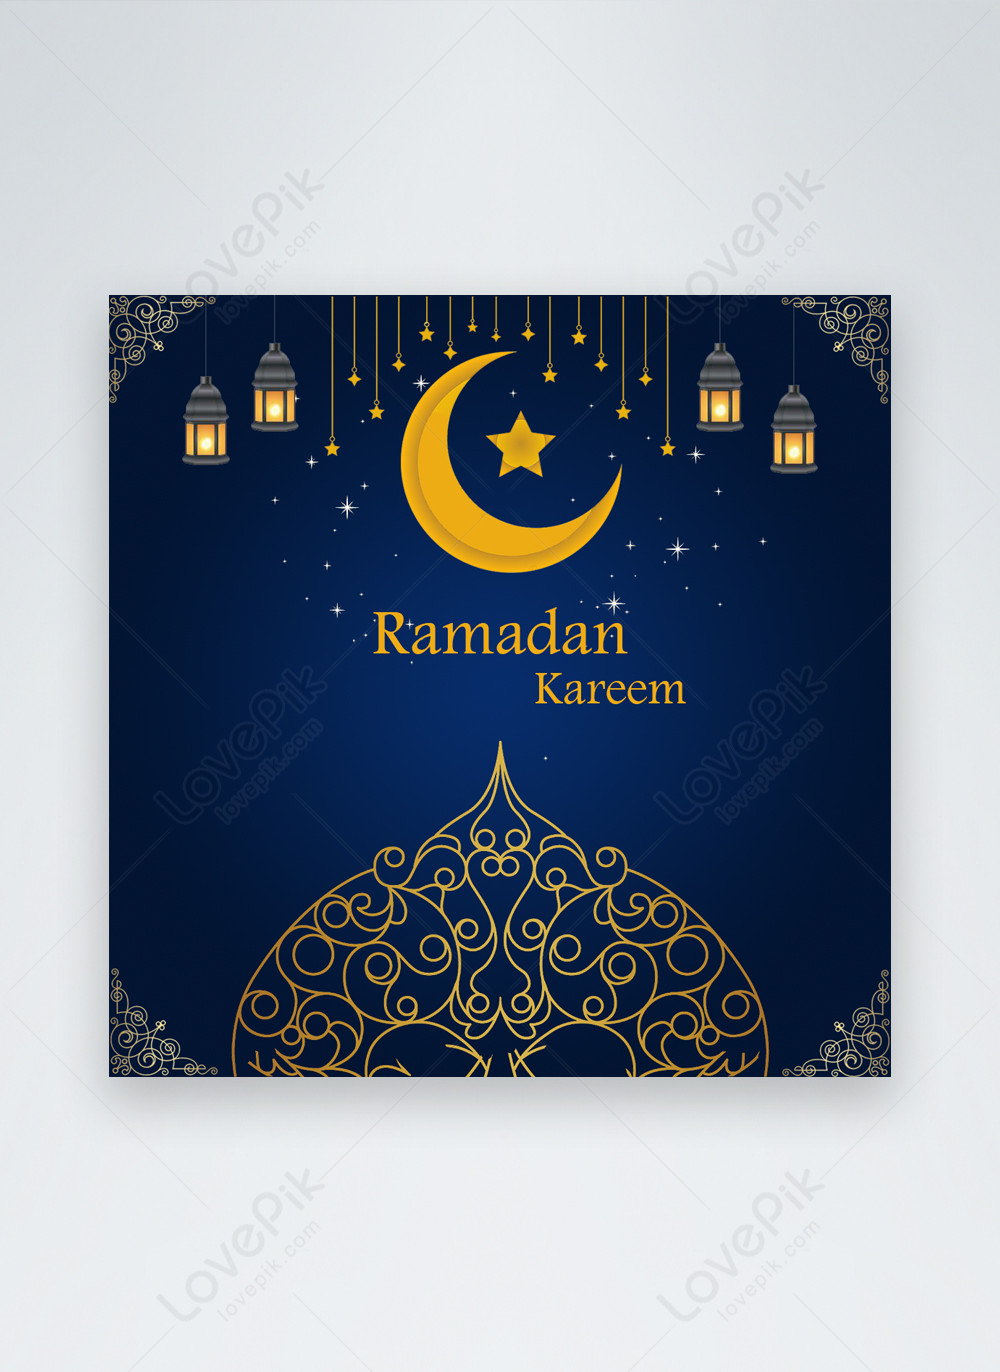 Blue Ramadhan Kareem Media Media Sosial Gambar Unduh Gratis Templat 450067969 Format Gambar Psd Lovepik Com